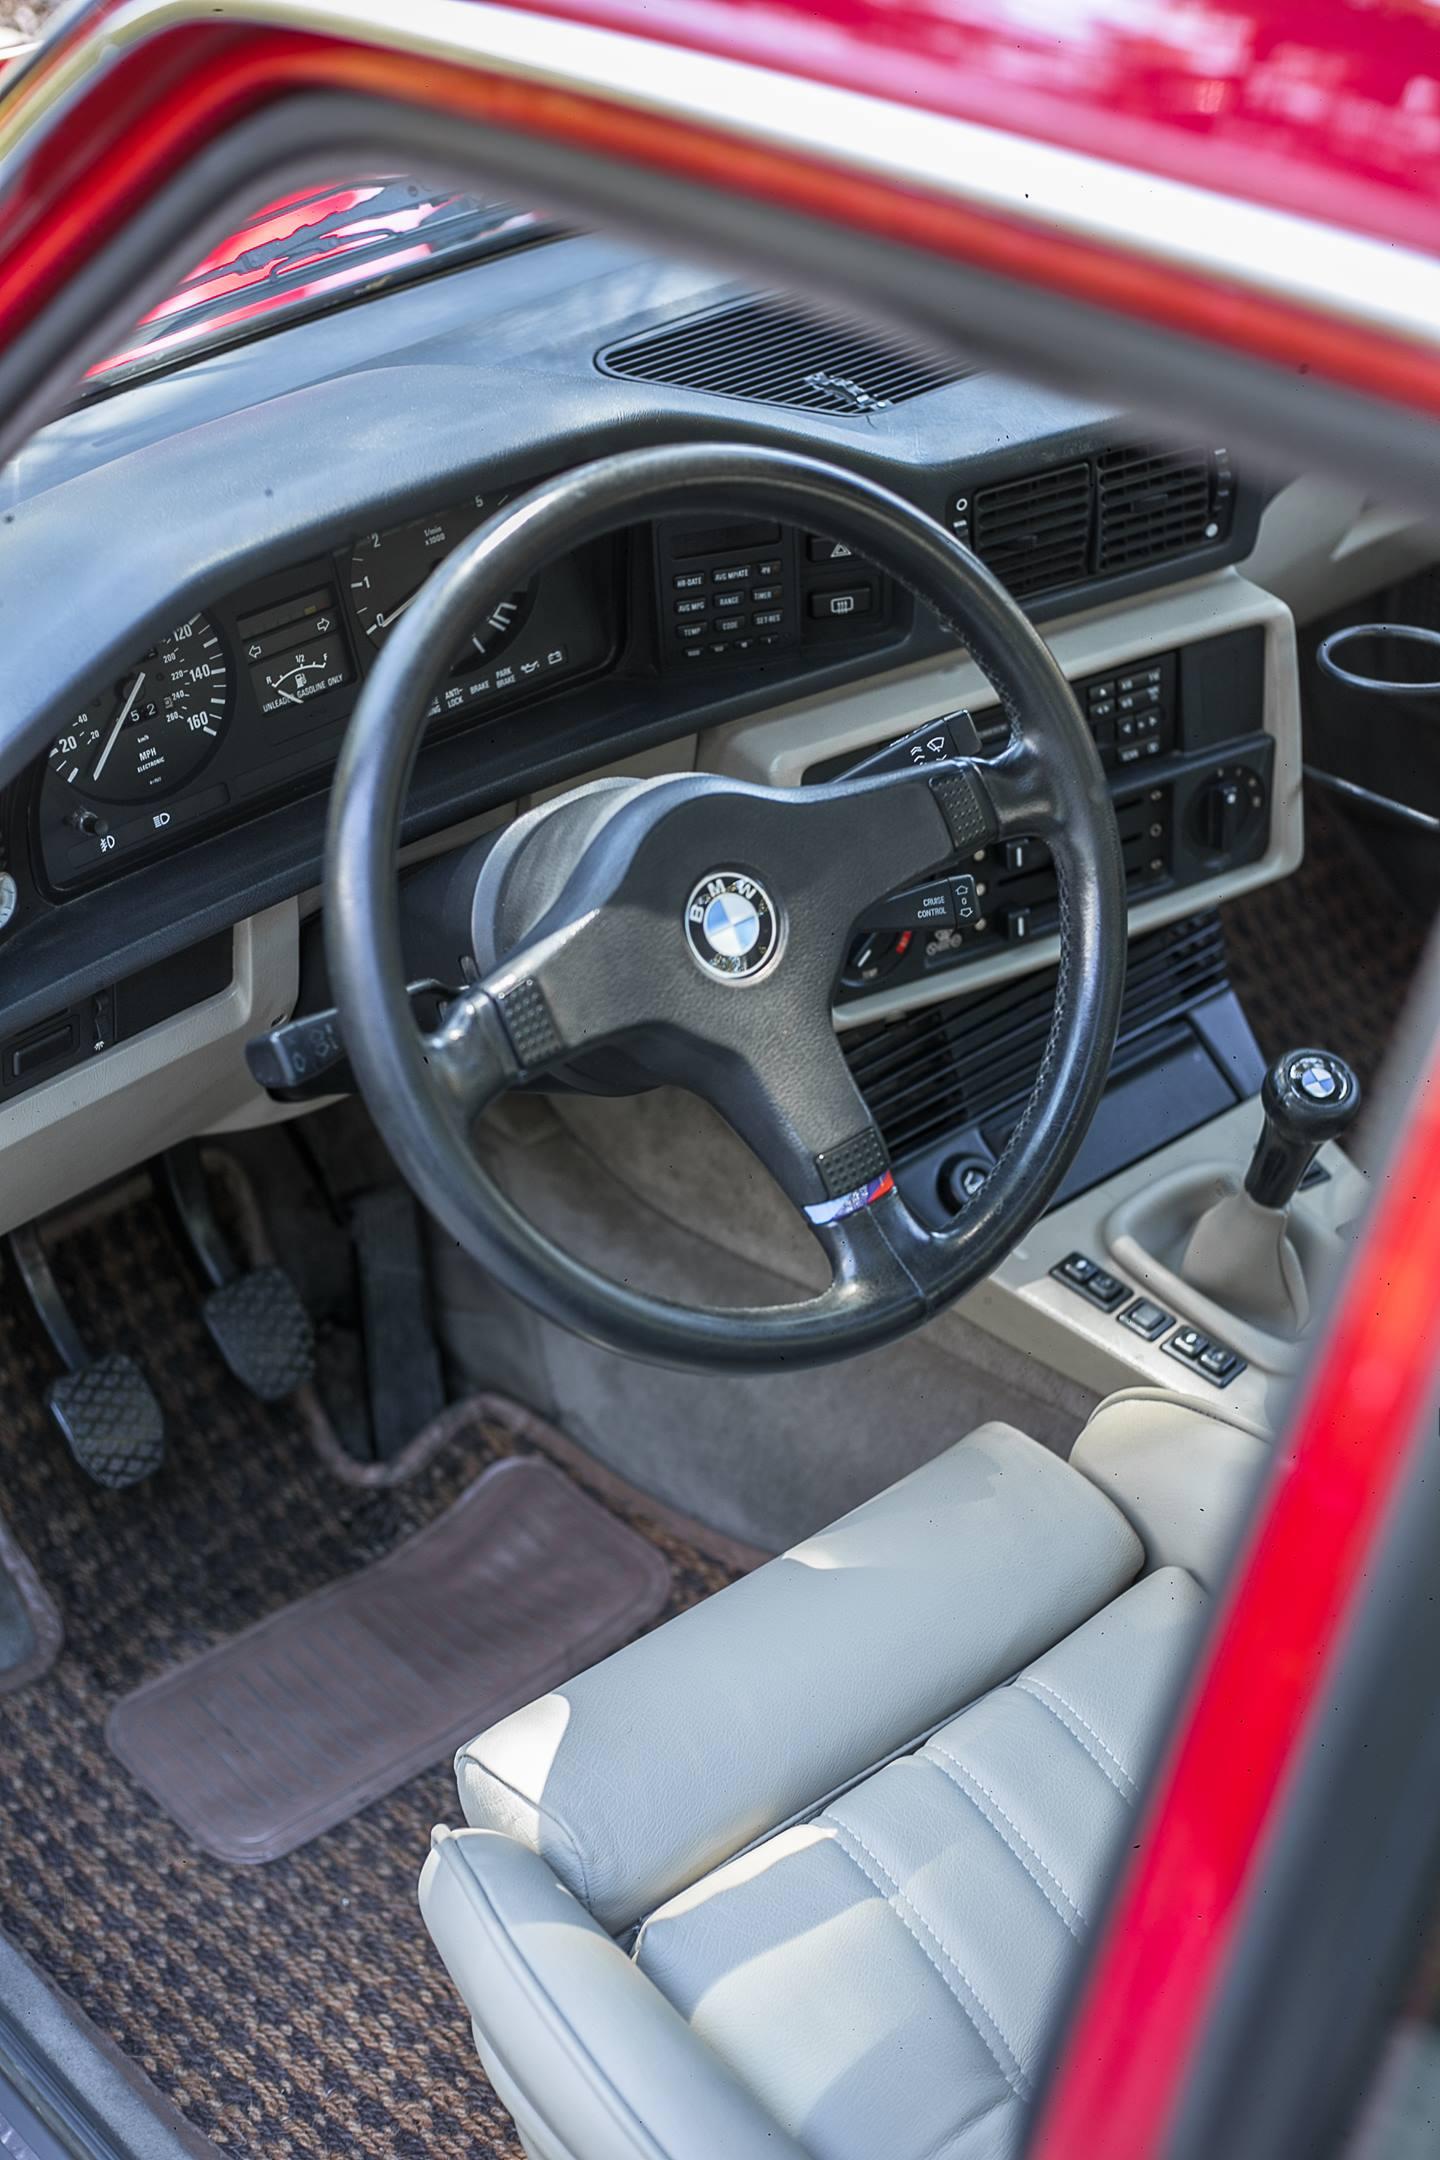 Austin Caccavo's 1987 BMW 535is interior